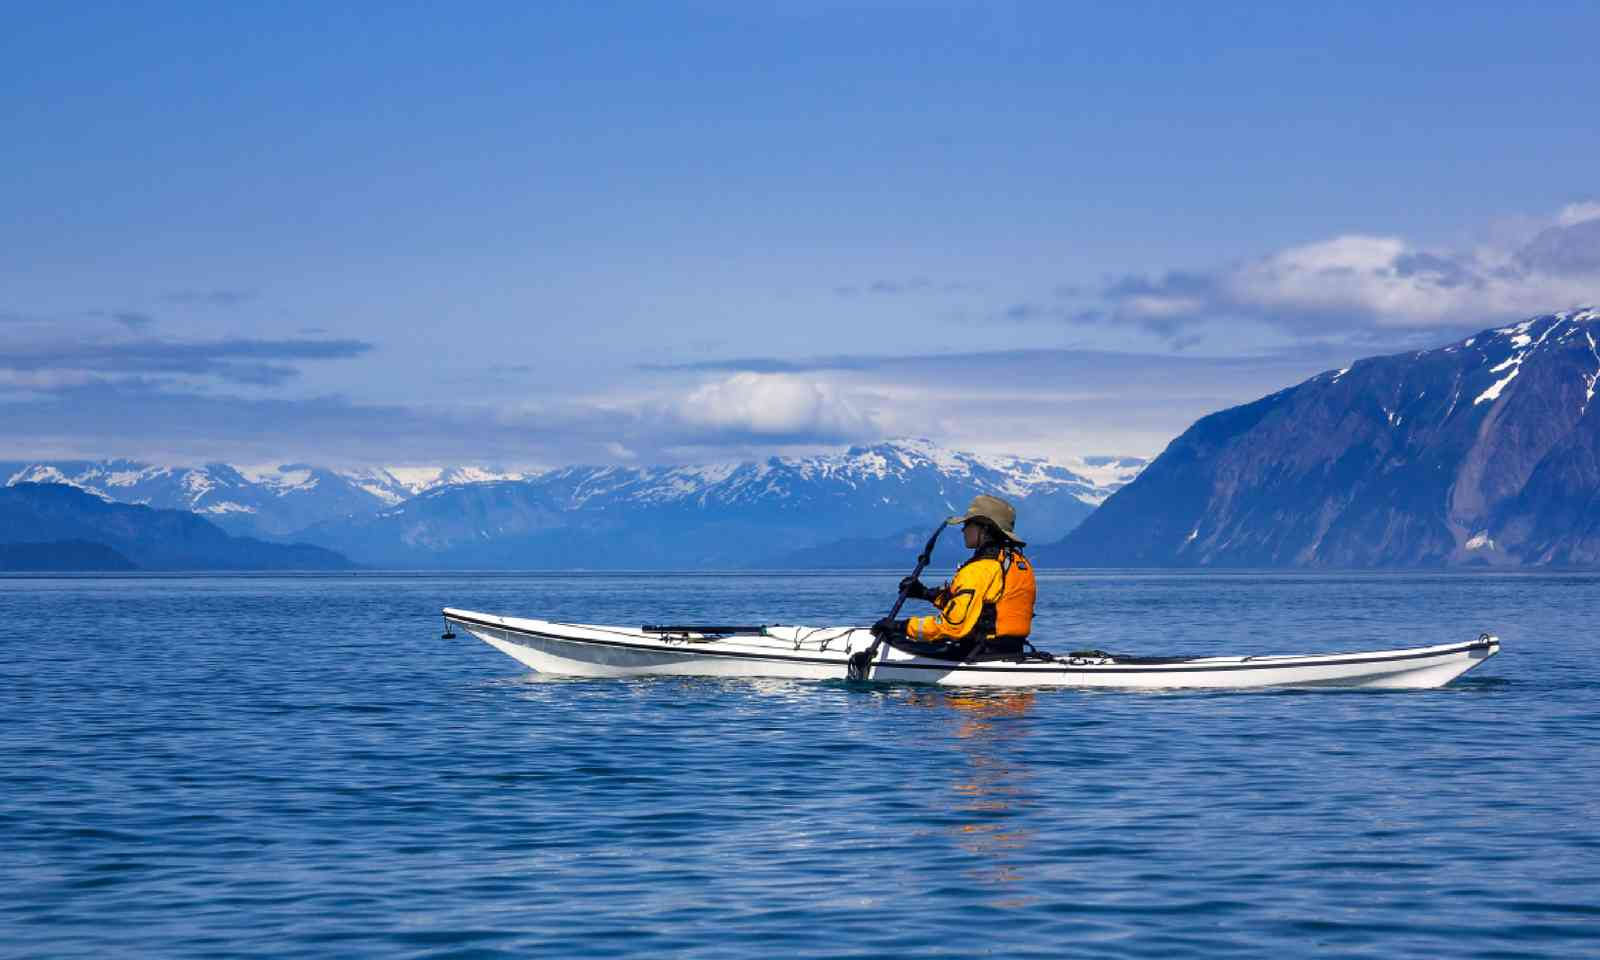 Kayaking in Glacier Bay National Park (Shutterstock)